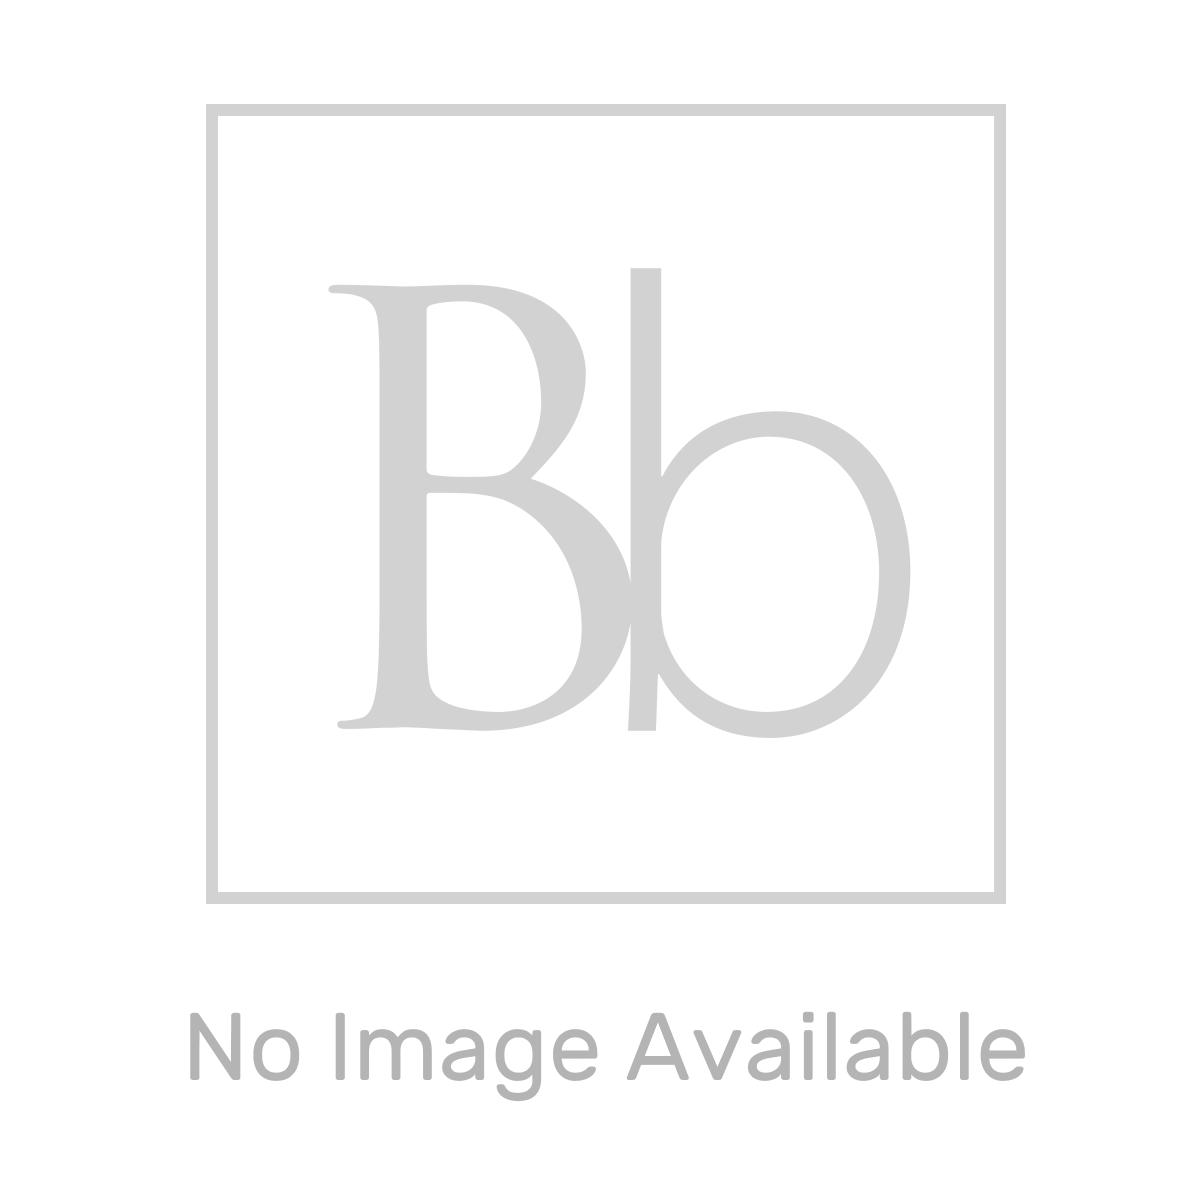 Aquadart White Slate Shower Tray 1200 x 700 Lifestyle